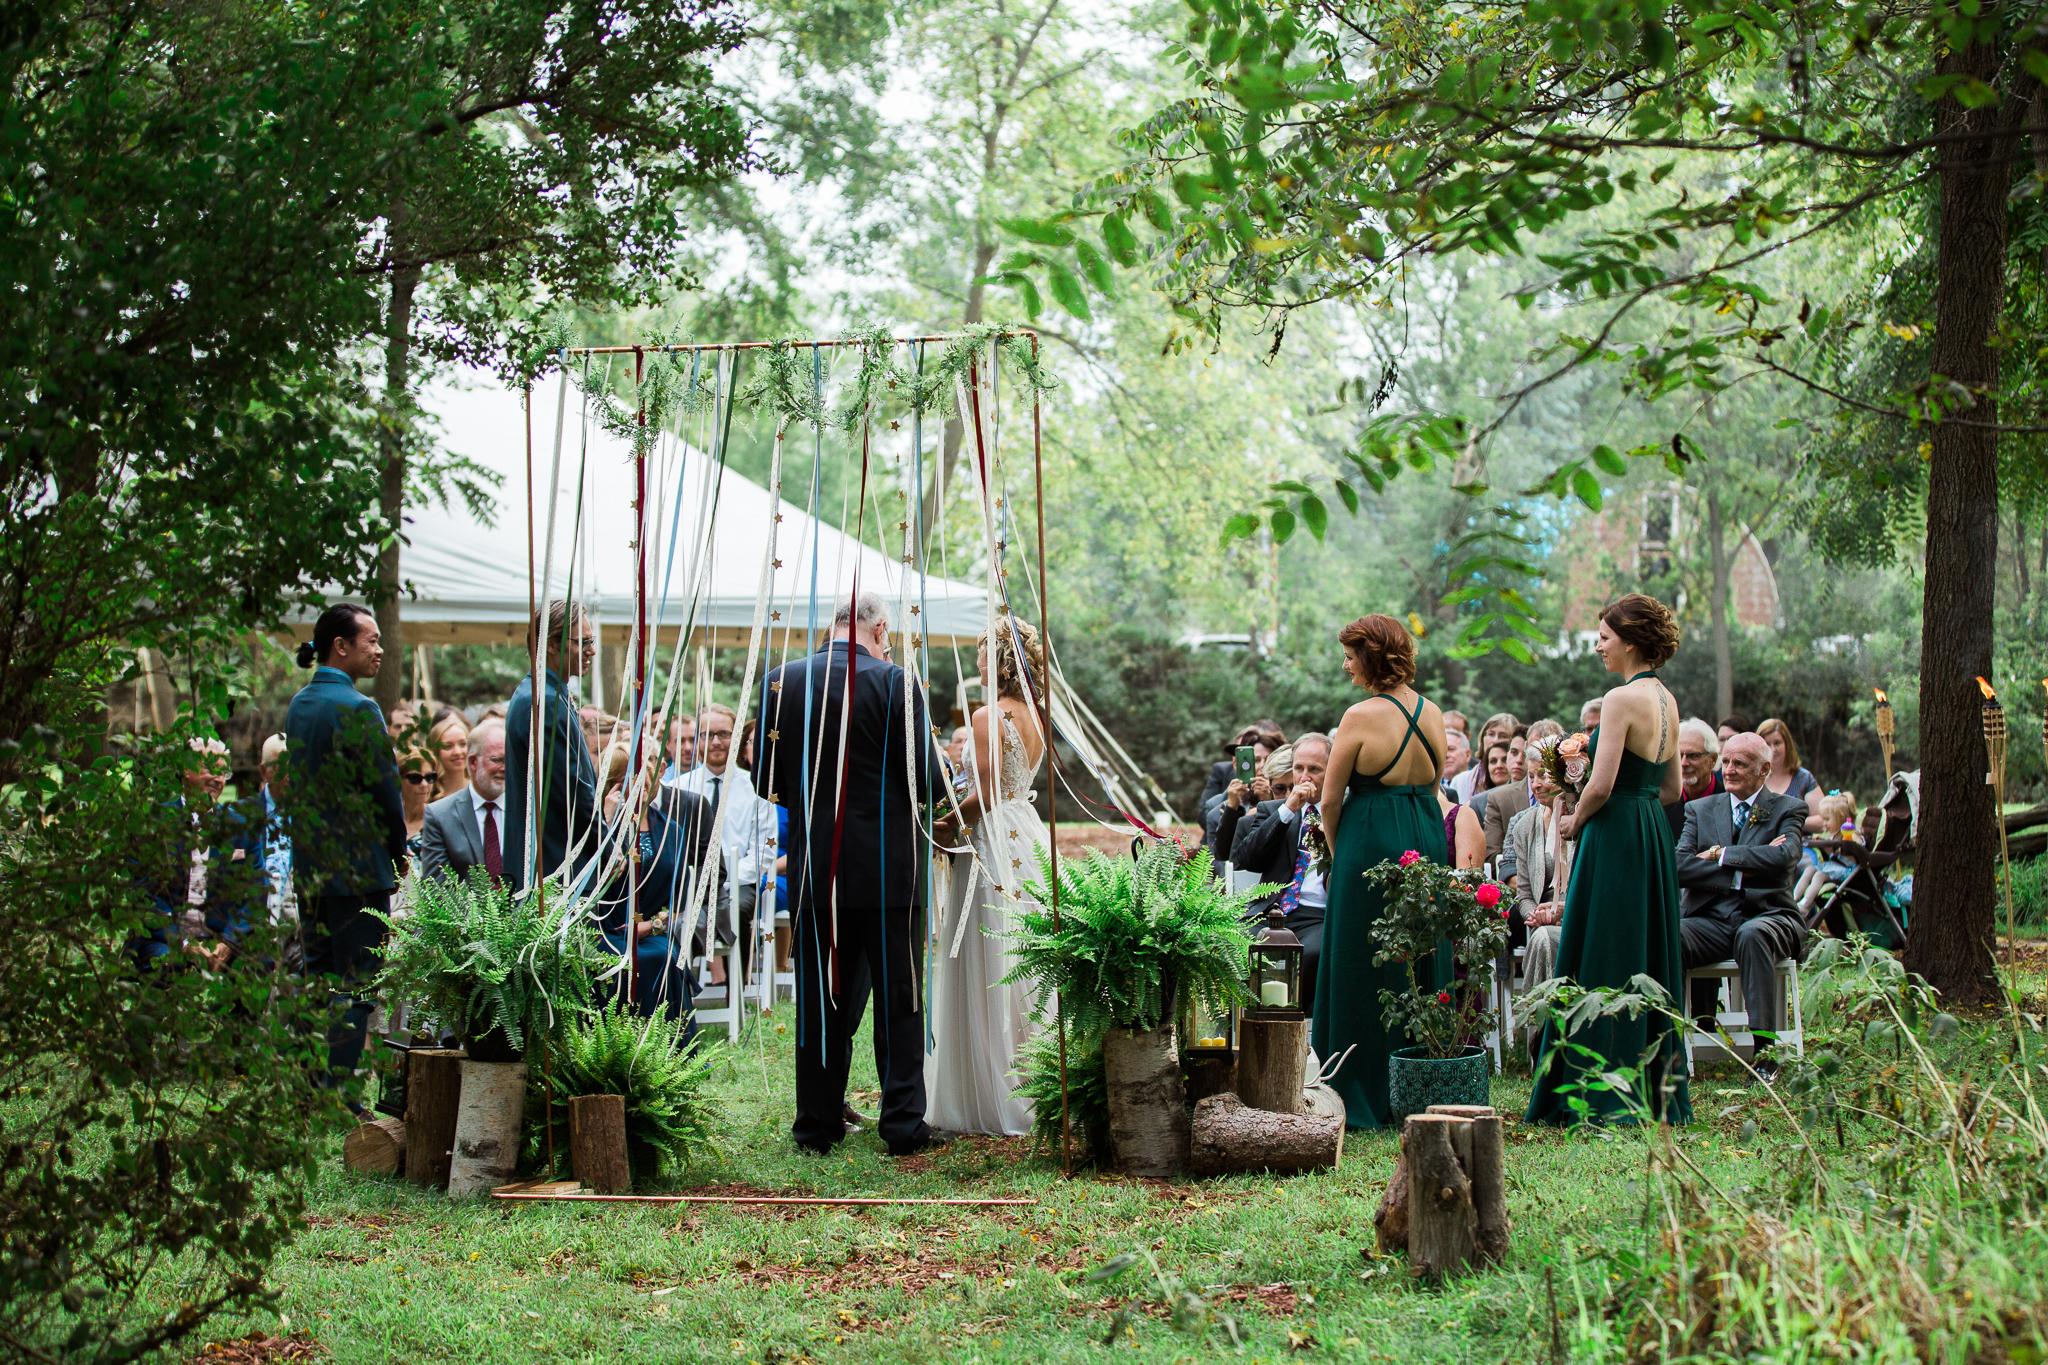 Paoli-Mill-wedding-summer-Wisconsin_097.jpg